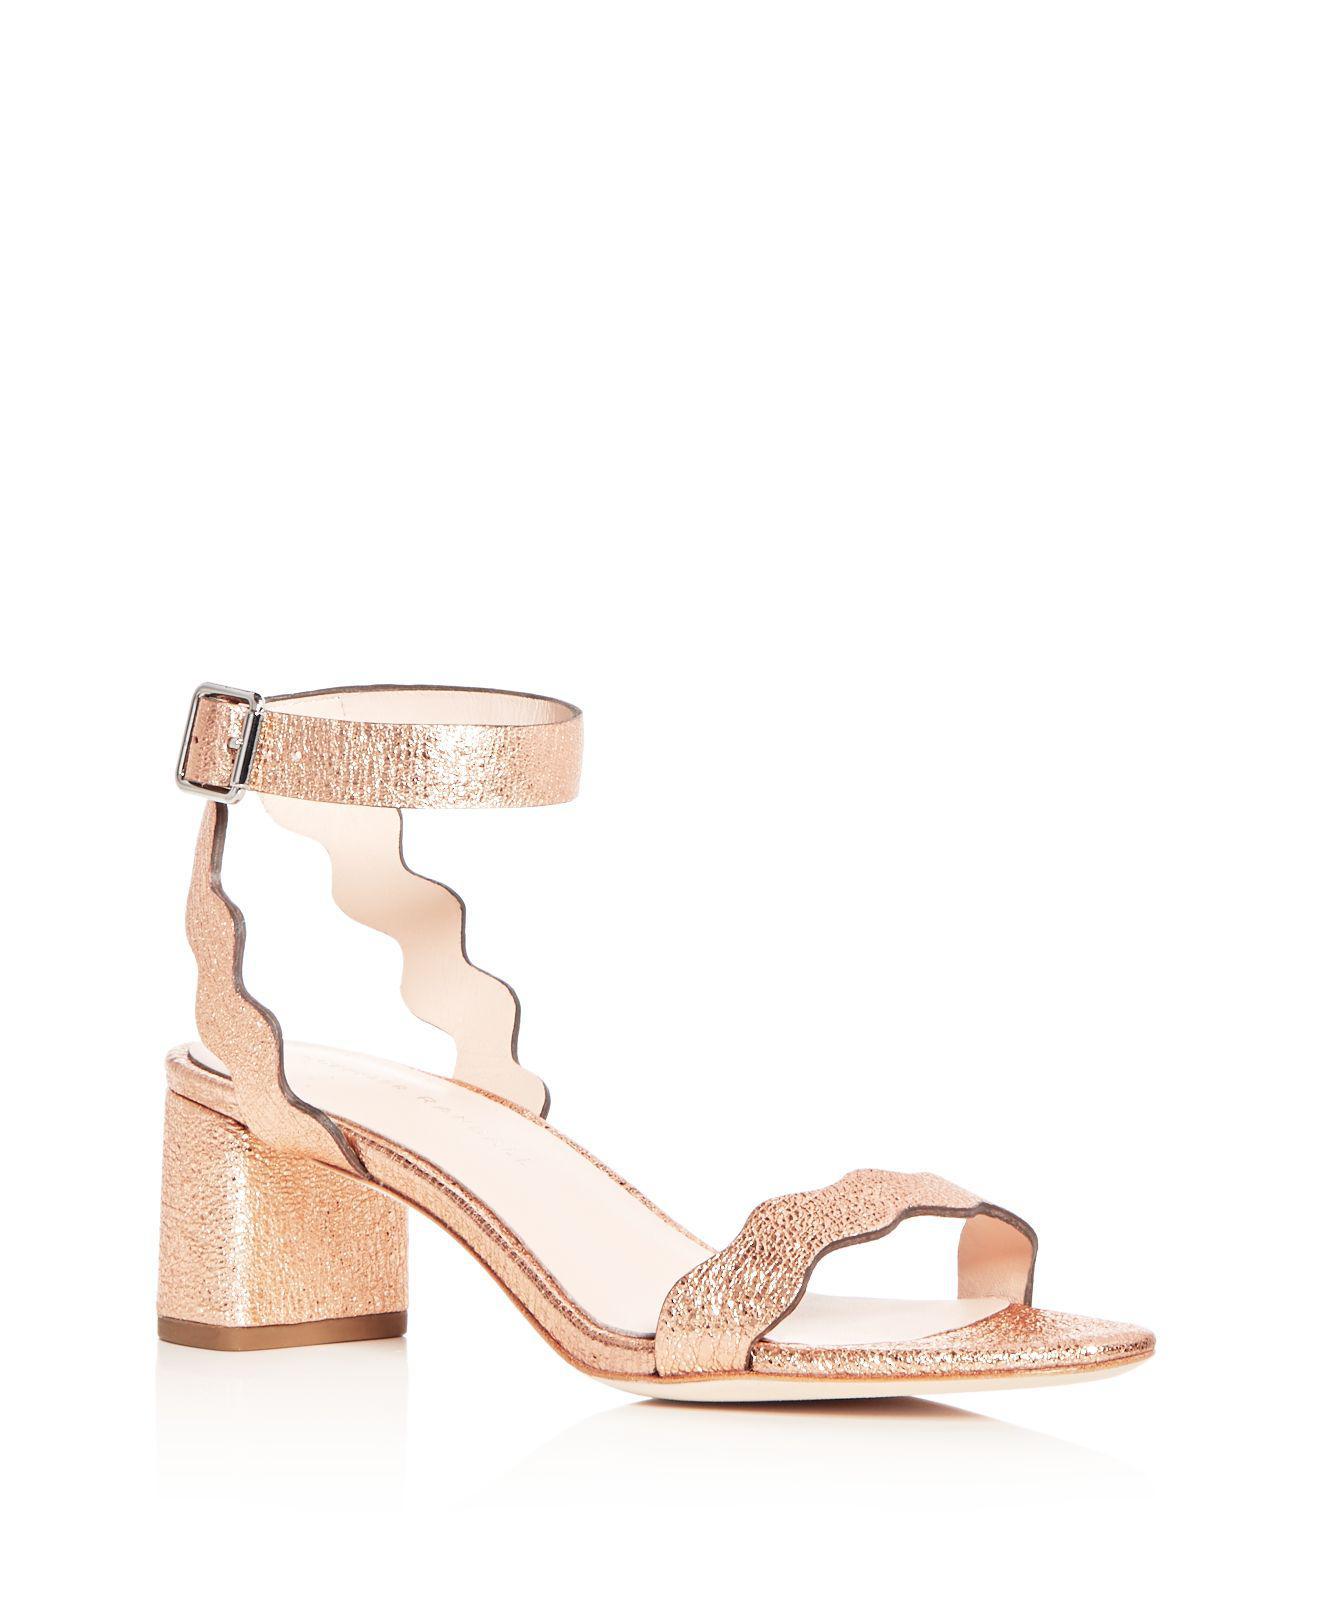 Loeffler Randall Women's Elena Leather T Strap Block Heel Sandals Emkzgllg